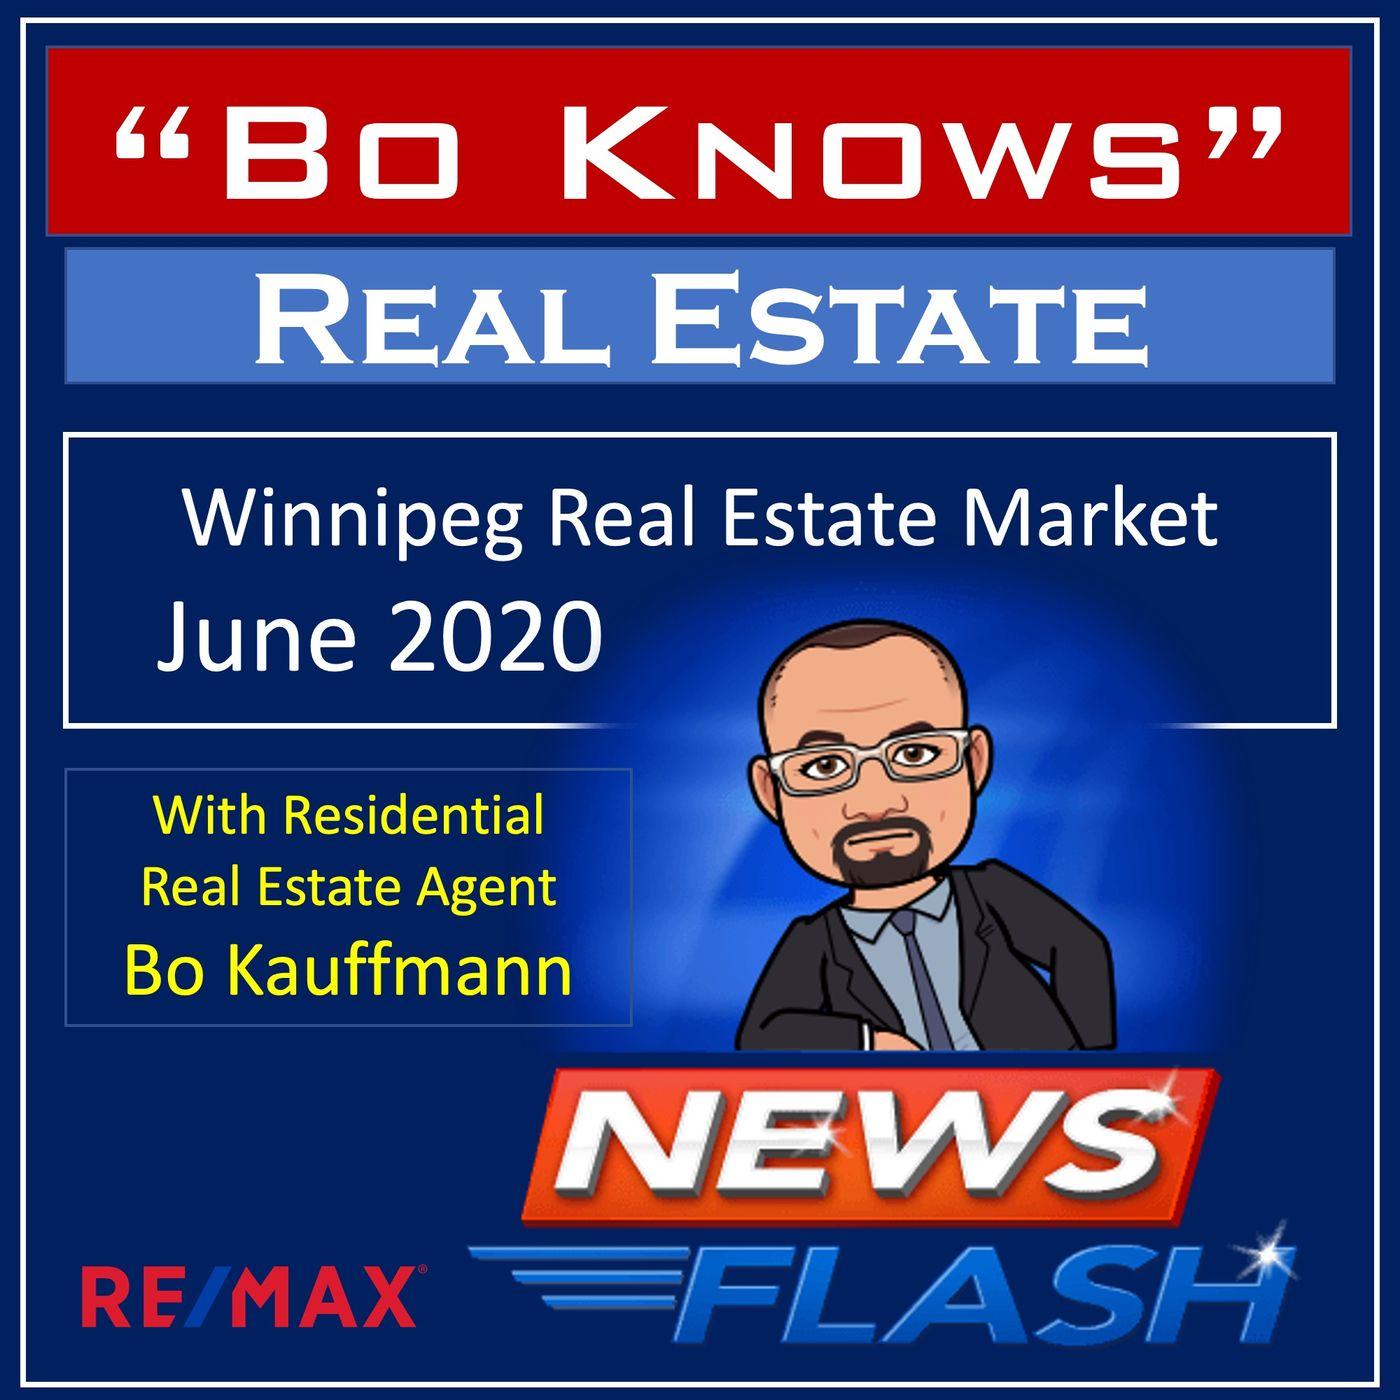 Winnipeg Real Estate Market Update June 2020